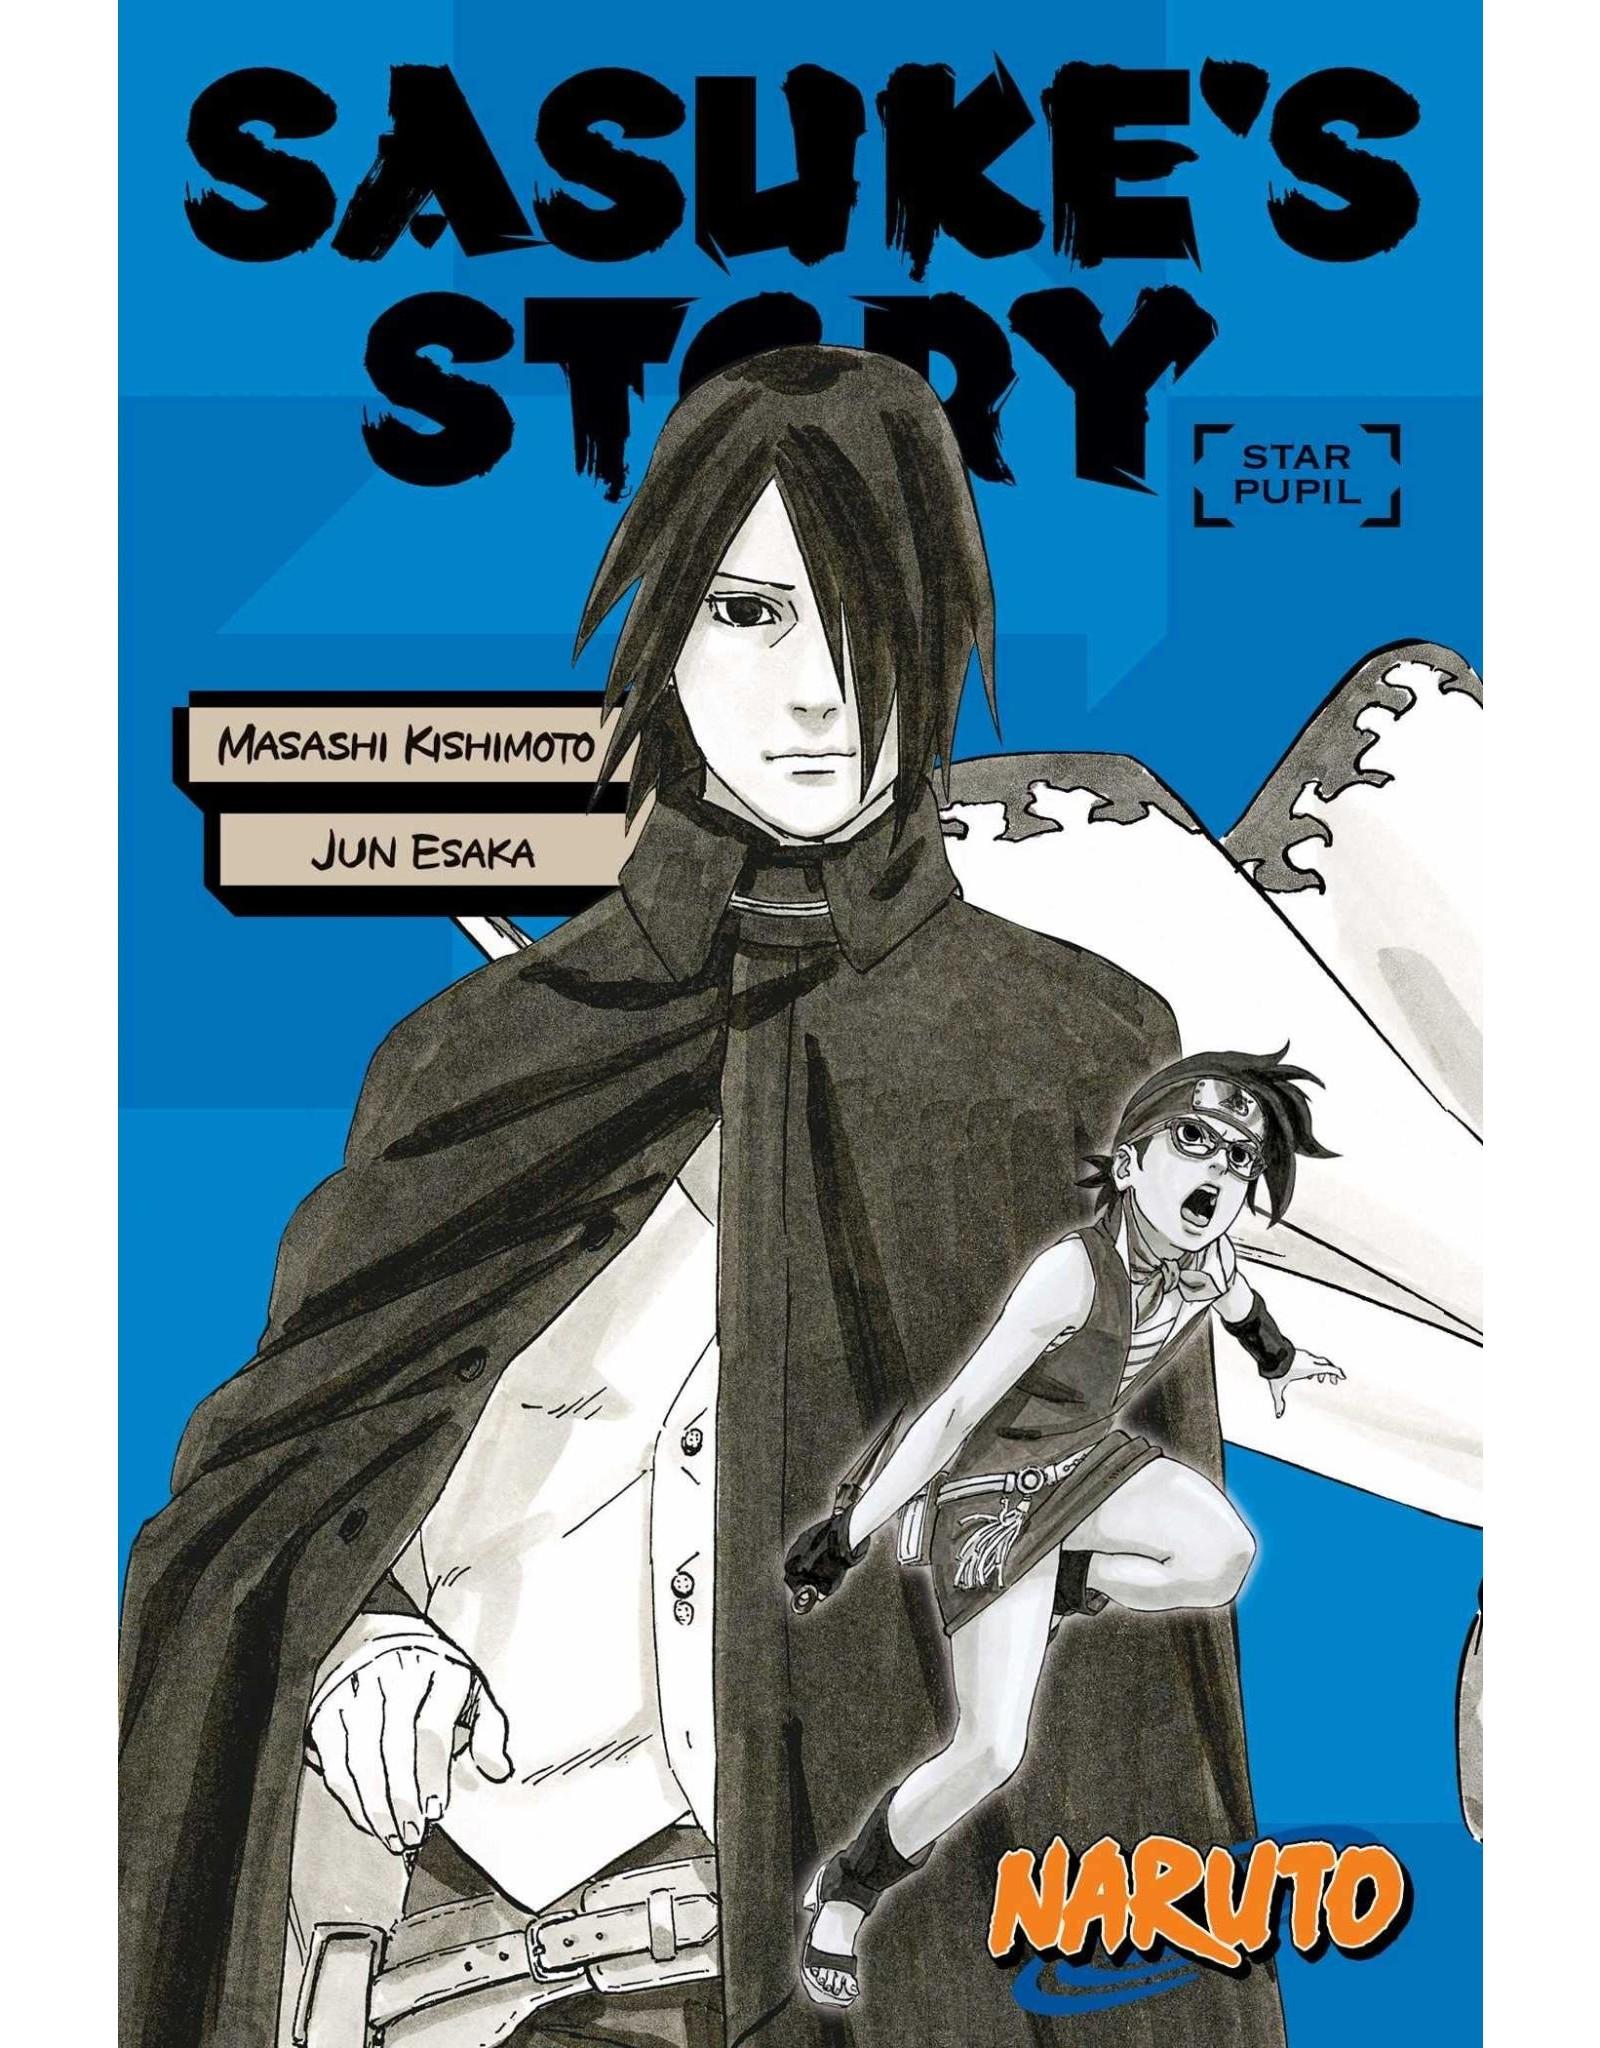 Naruto: Sasuke's Story: Star Pupil (English) - Light Novel